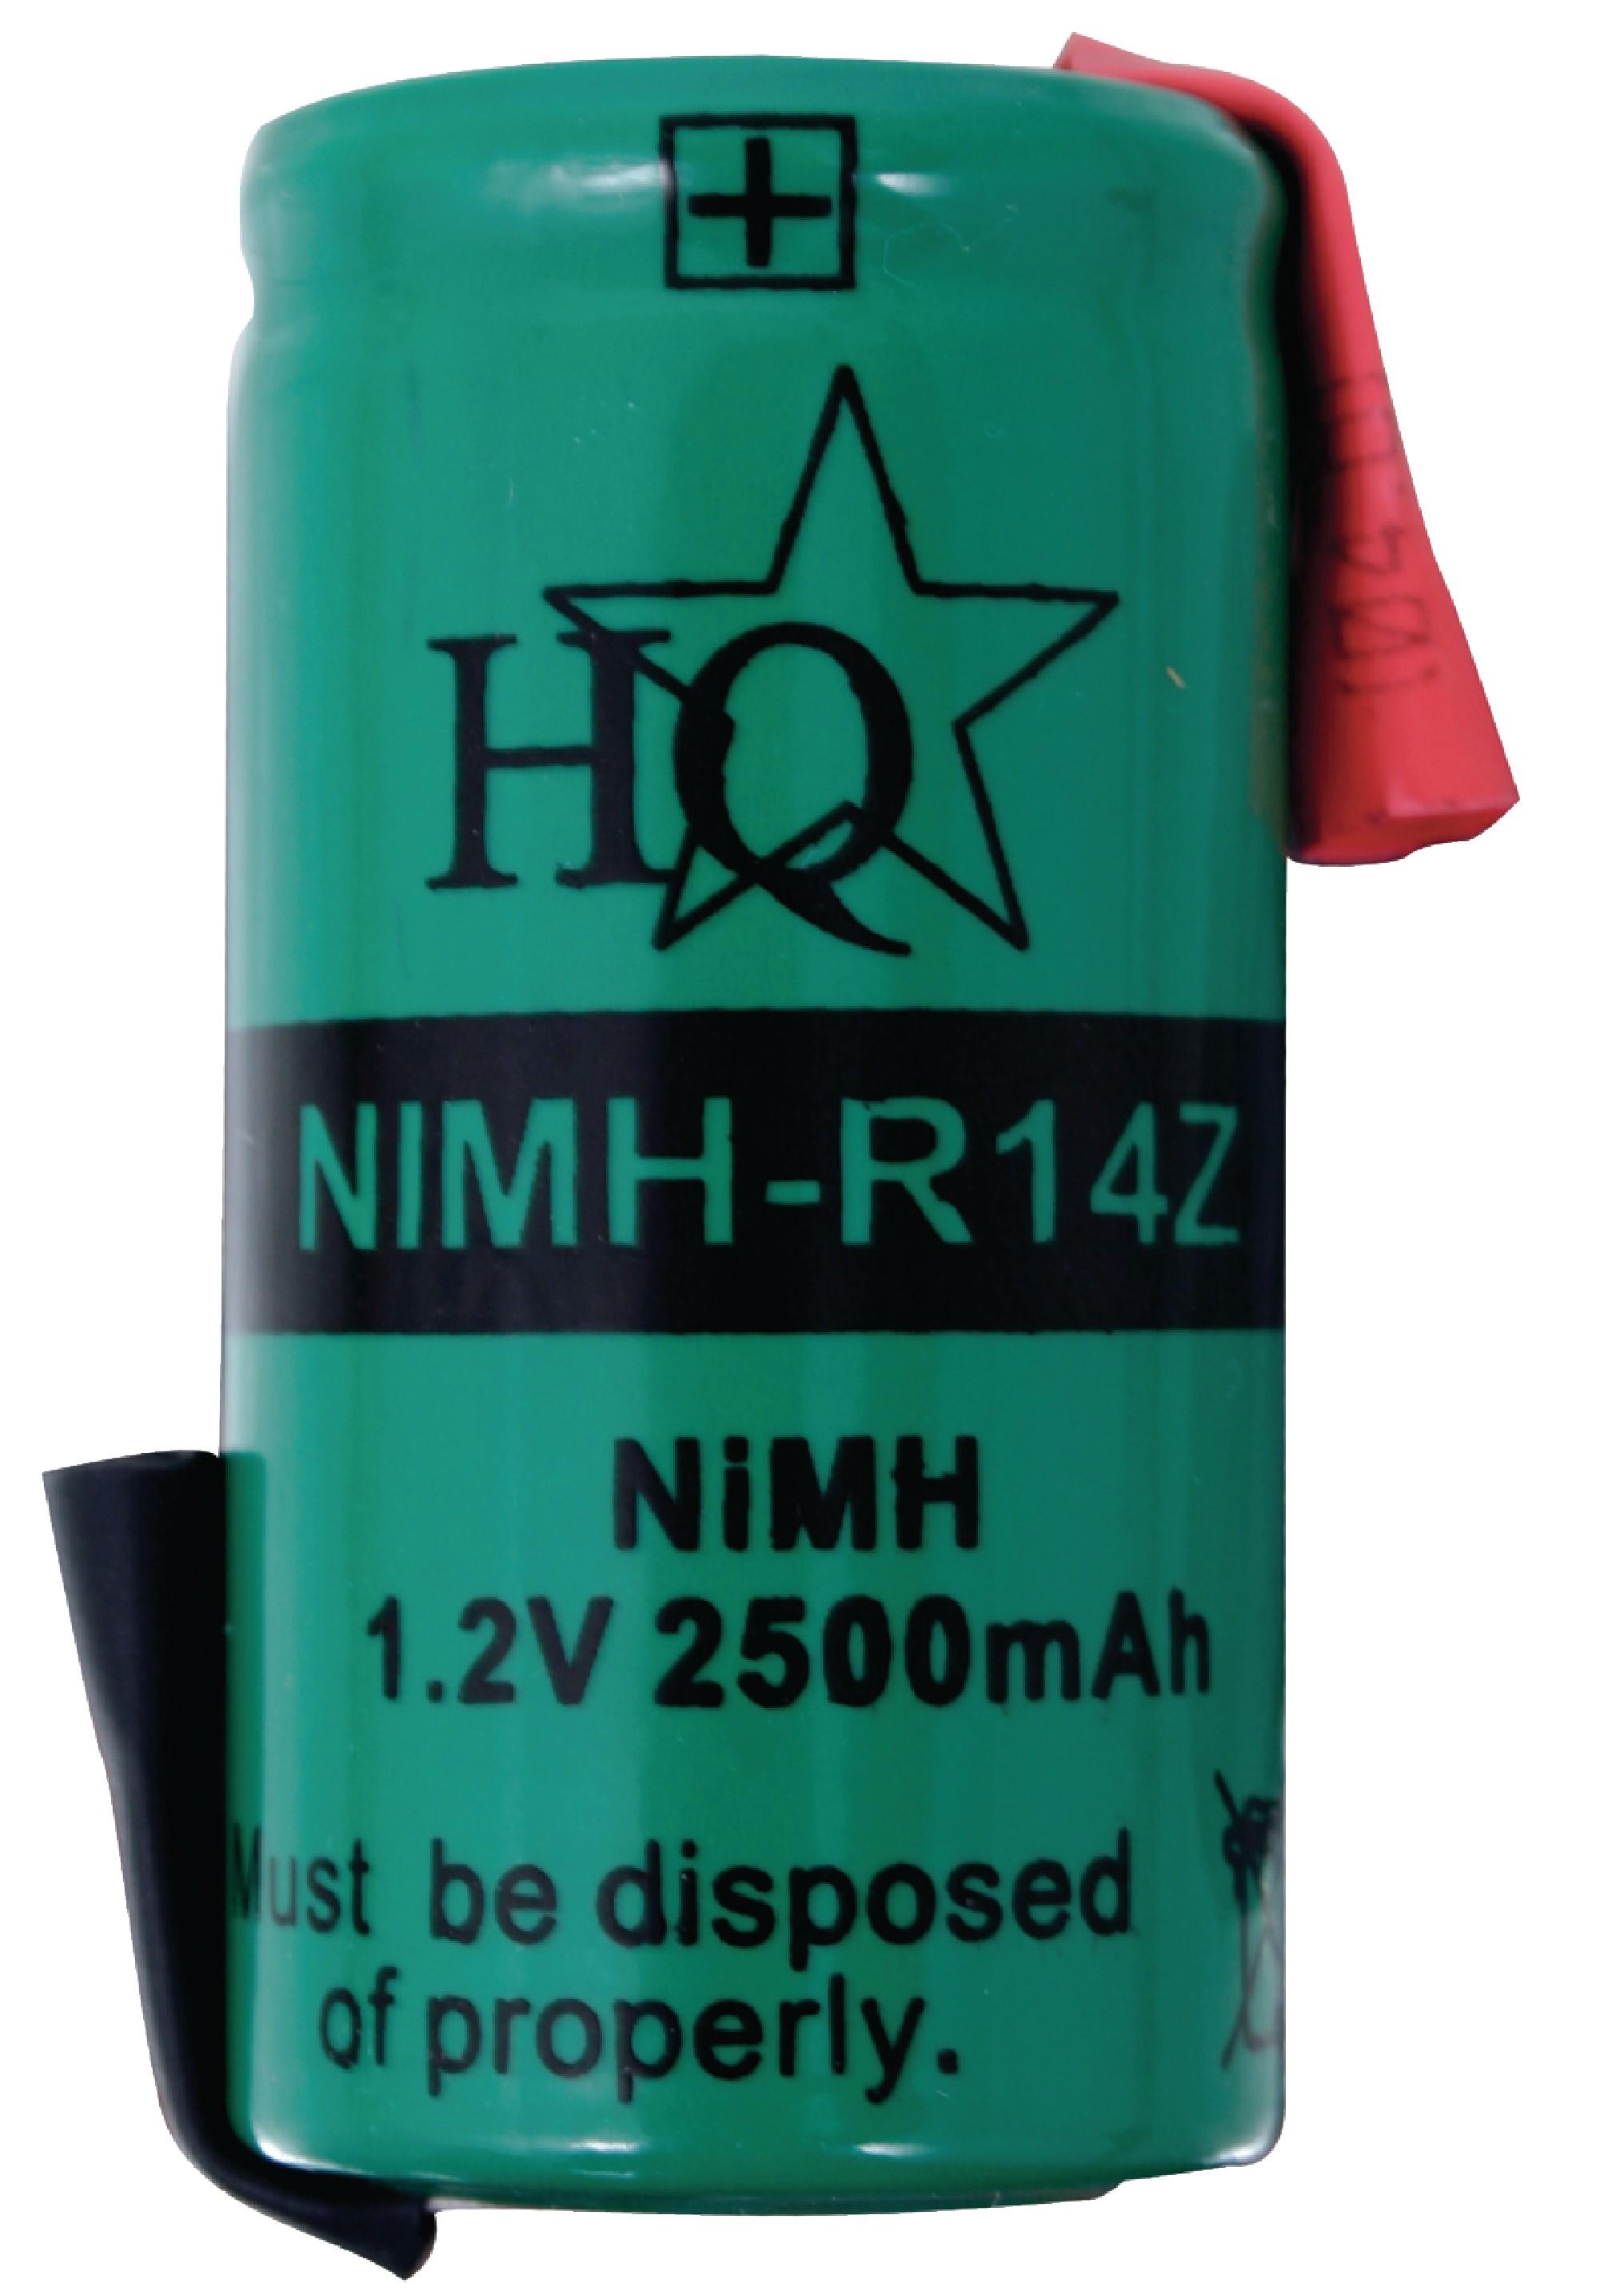 Akumulátor NiMH 1.2V/500mAh, NIMH-R14Z